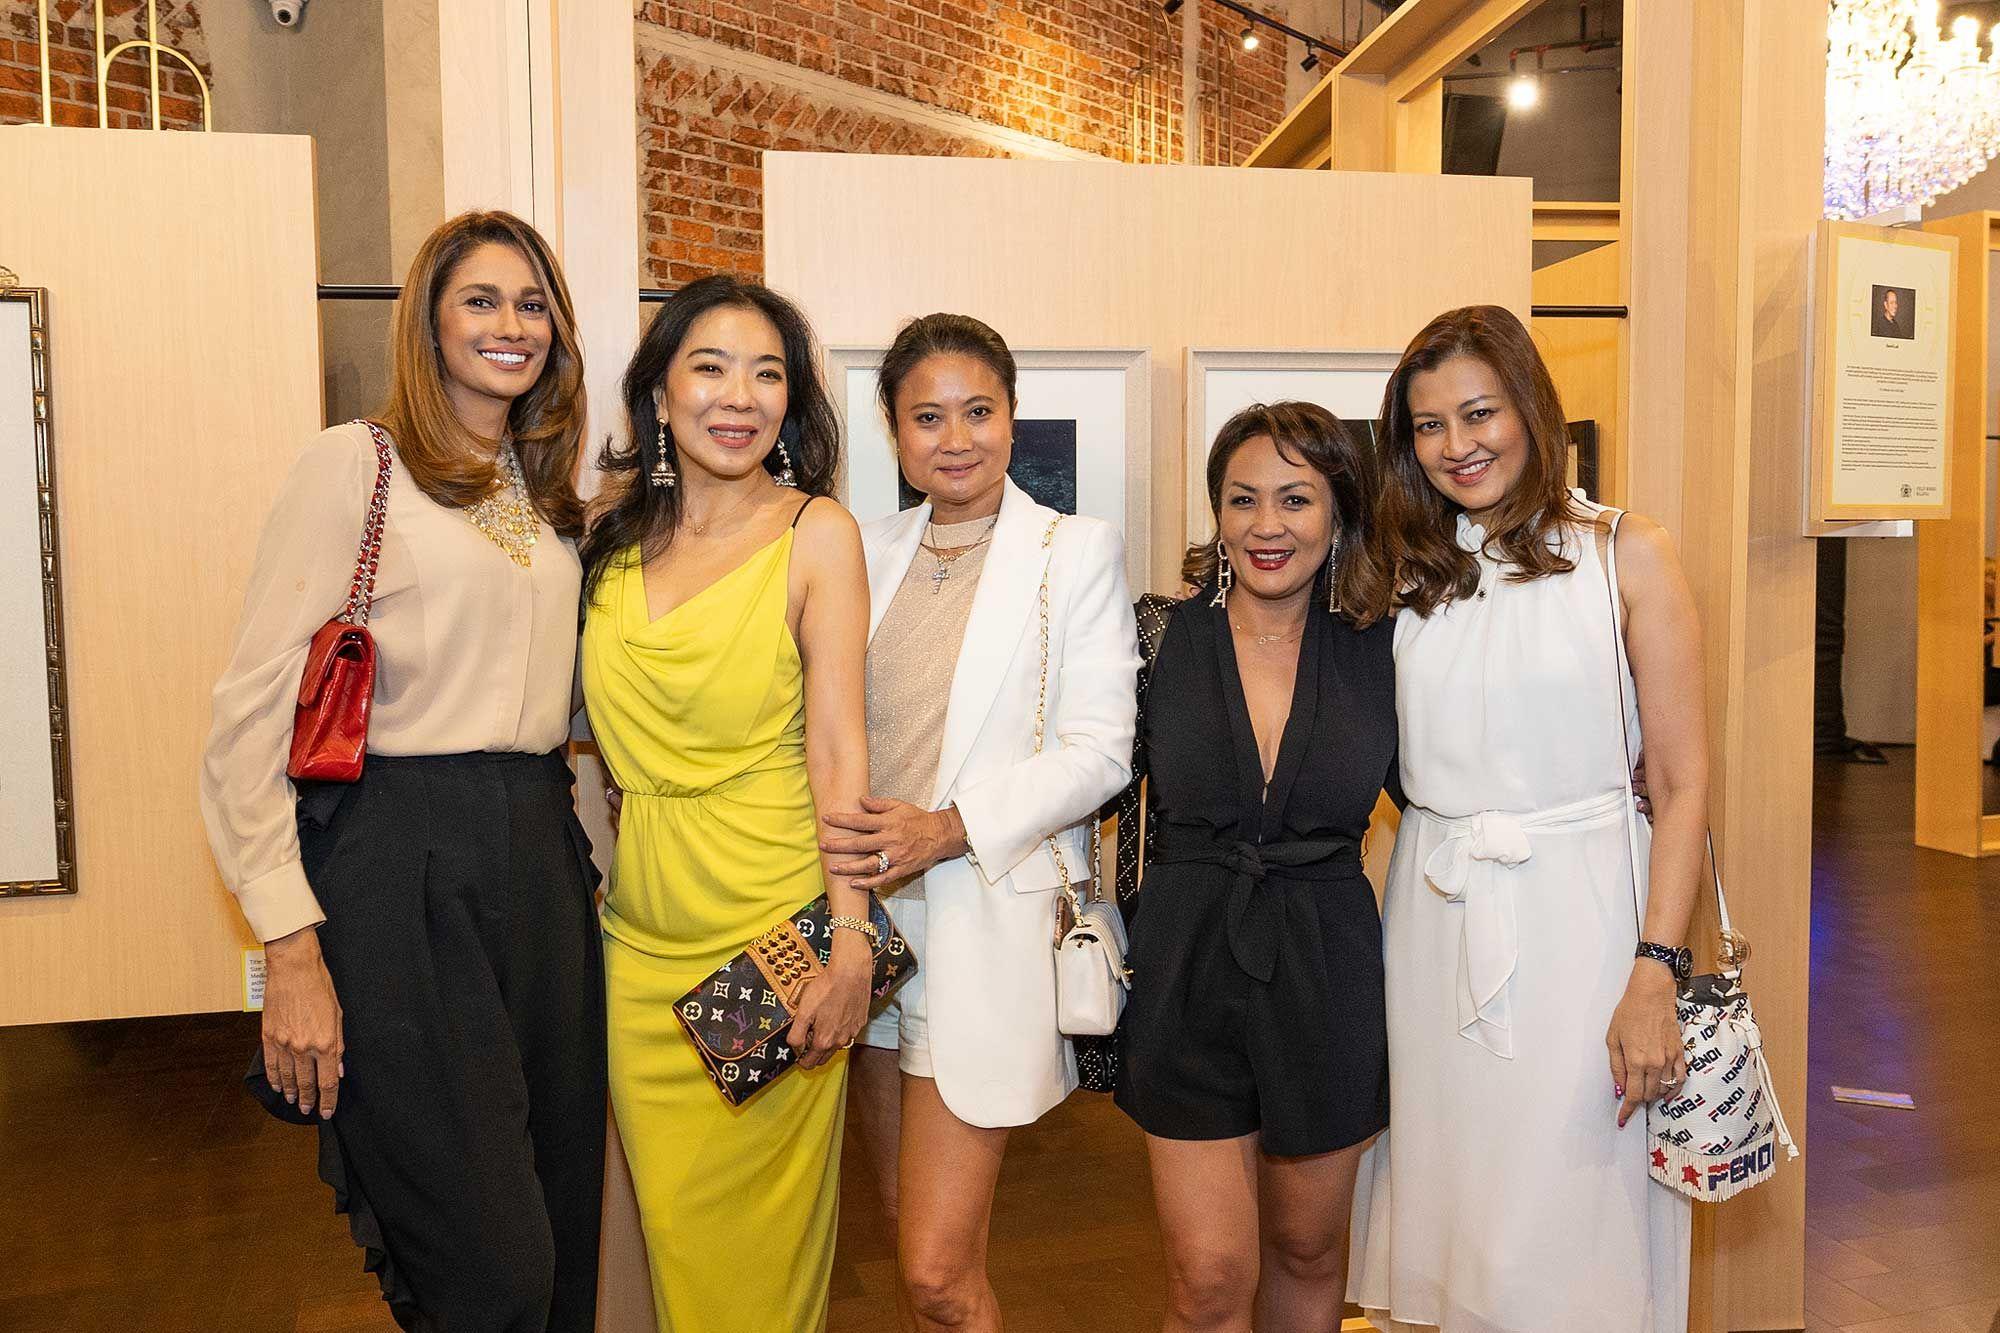 Kavita Sidhu, Lim Wei Ling, Christina Ho, Puteri Badrinise and Meera Sen